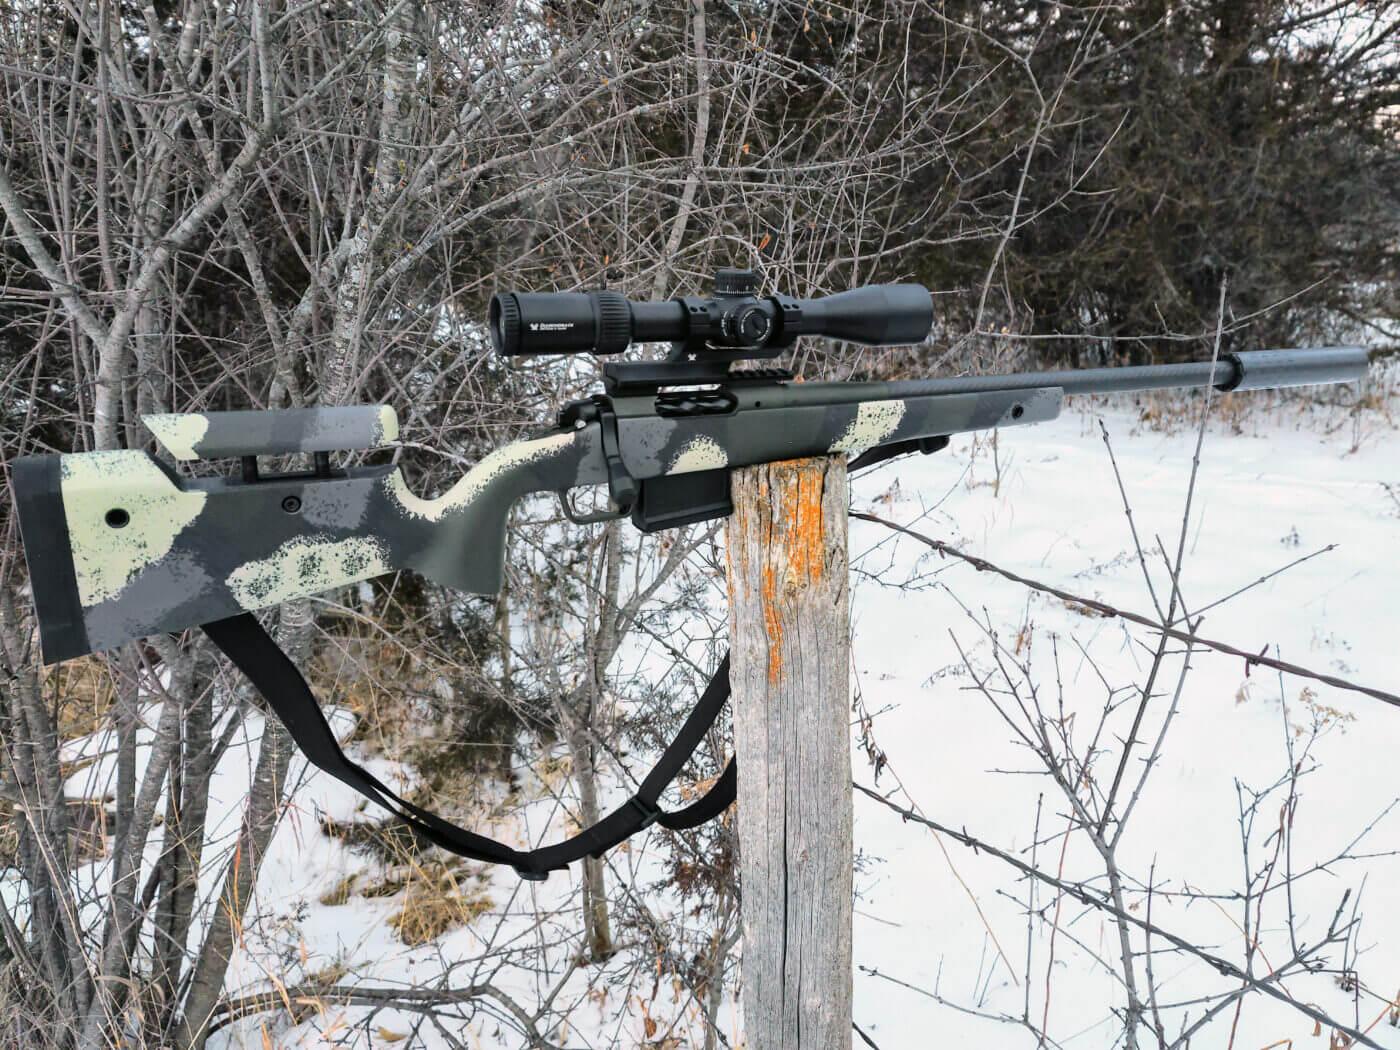 Lightweight Springfield Armory hunting rifle